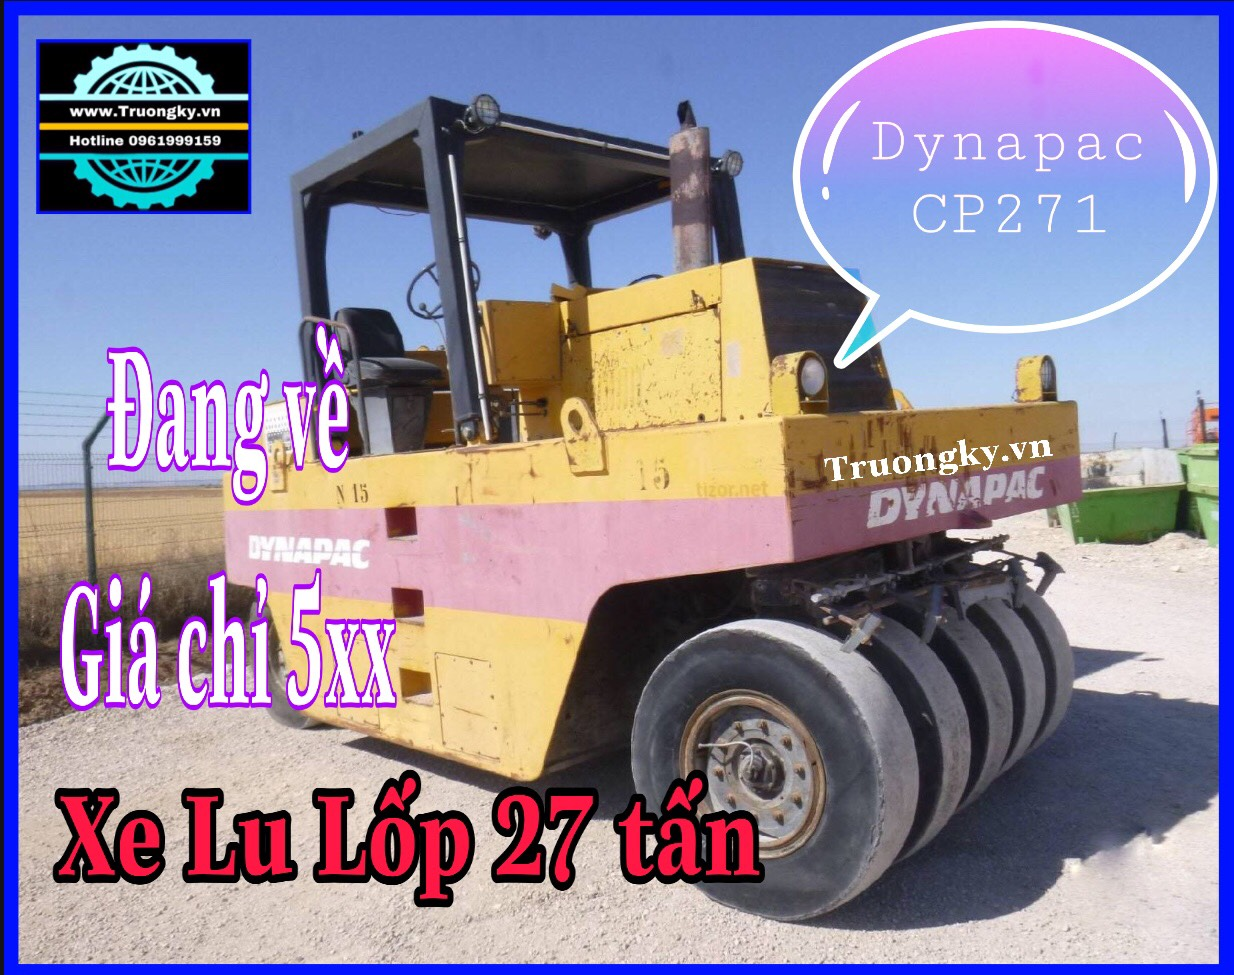 Lu lốp 27 tấn Dynapac CP271 (SOLD)